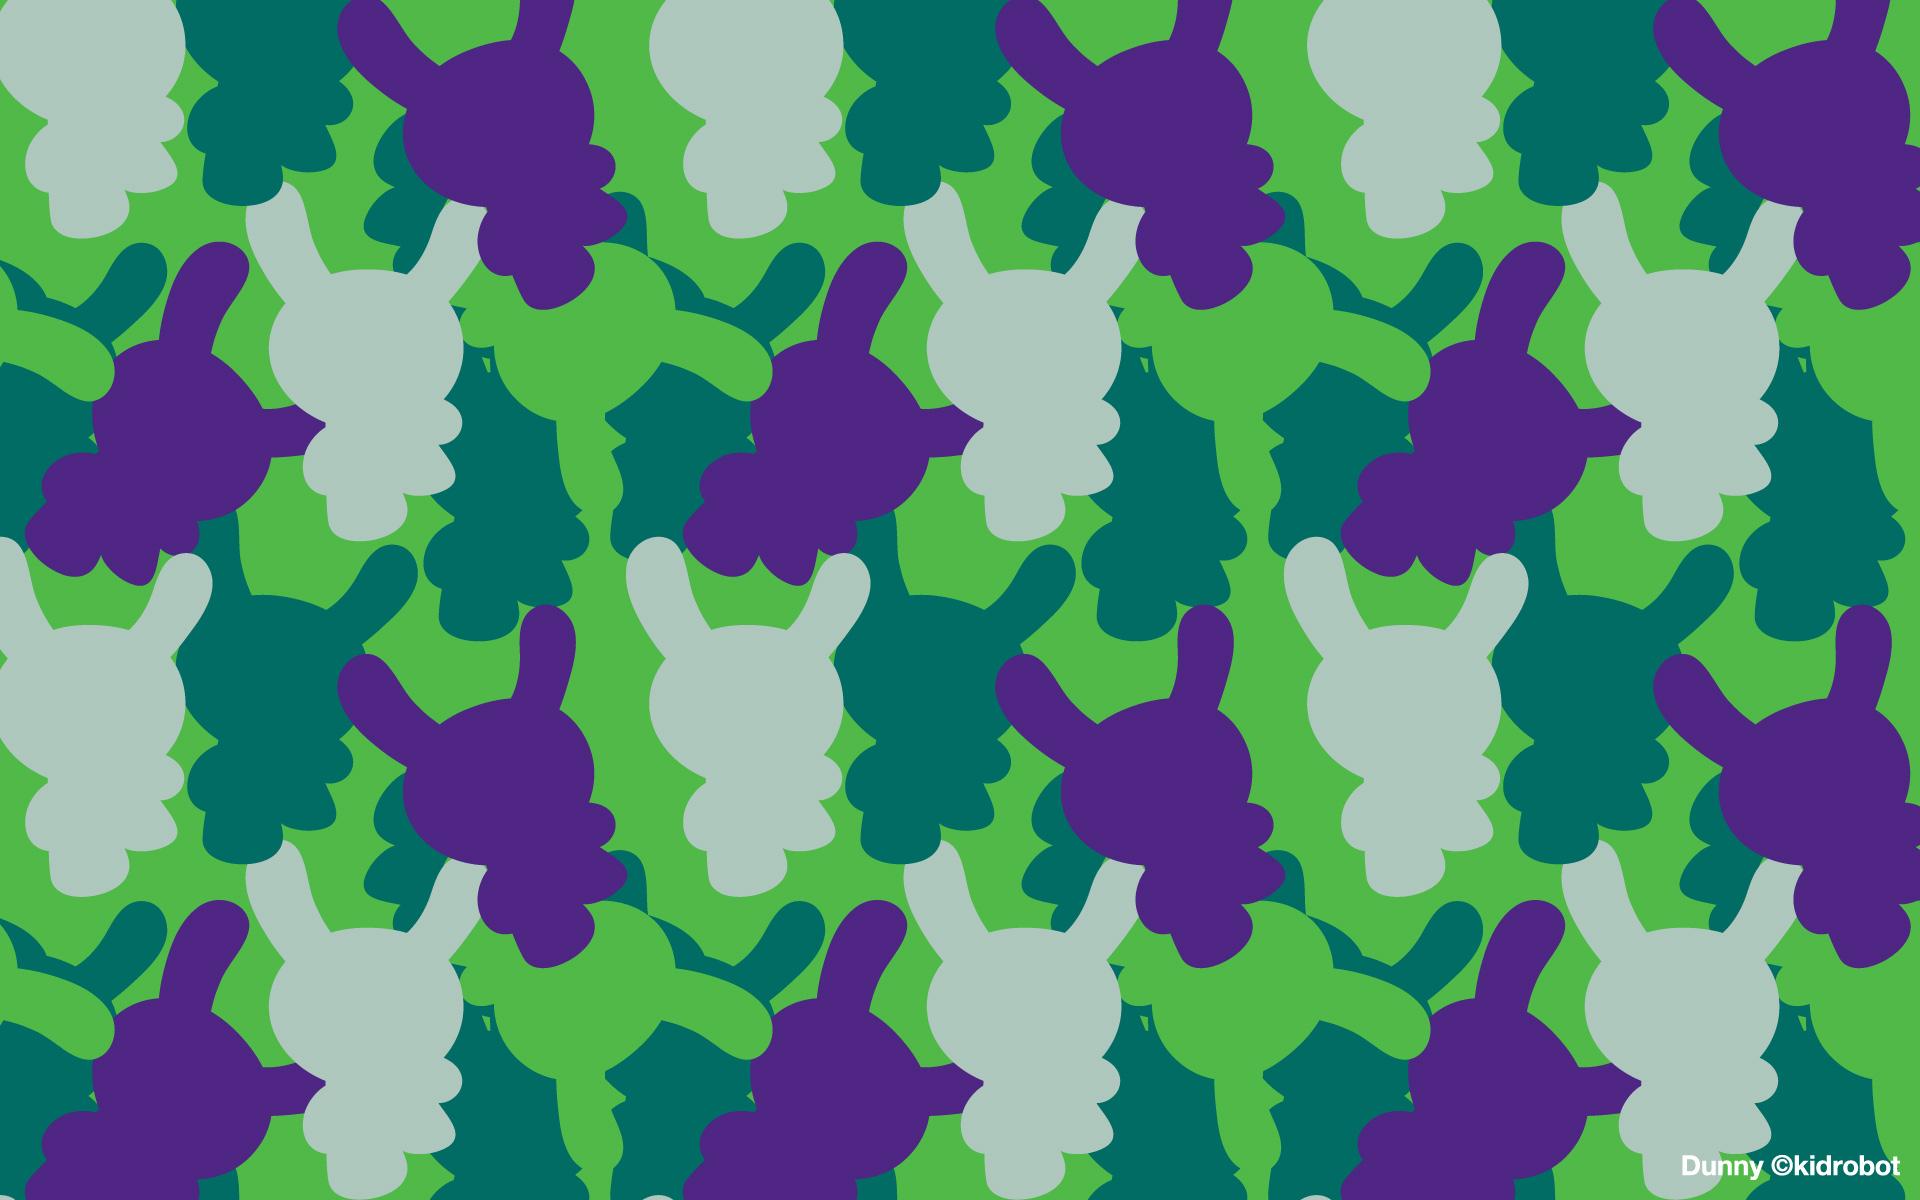 sites kidrobot dunny wallpaper   ForWallpapercom 1920x1200